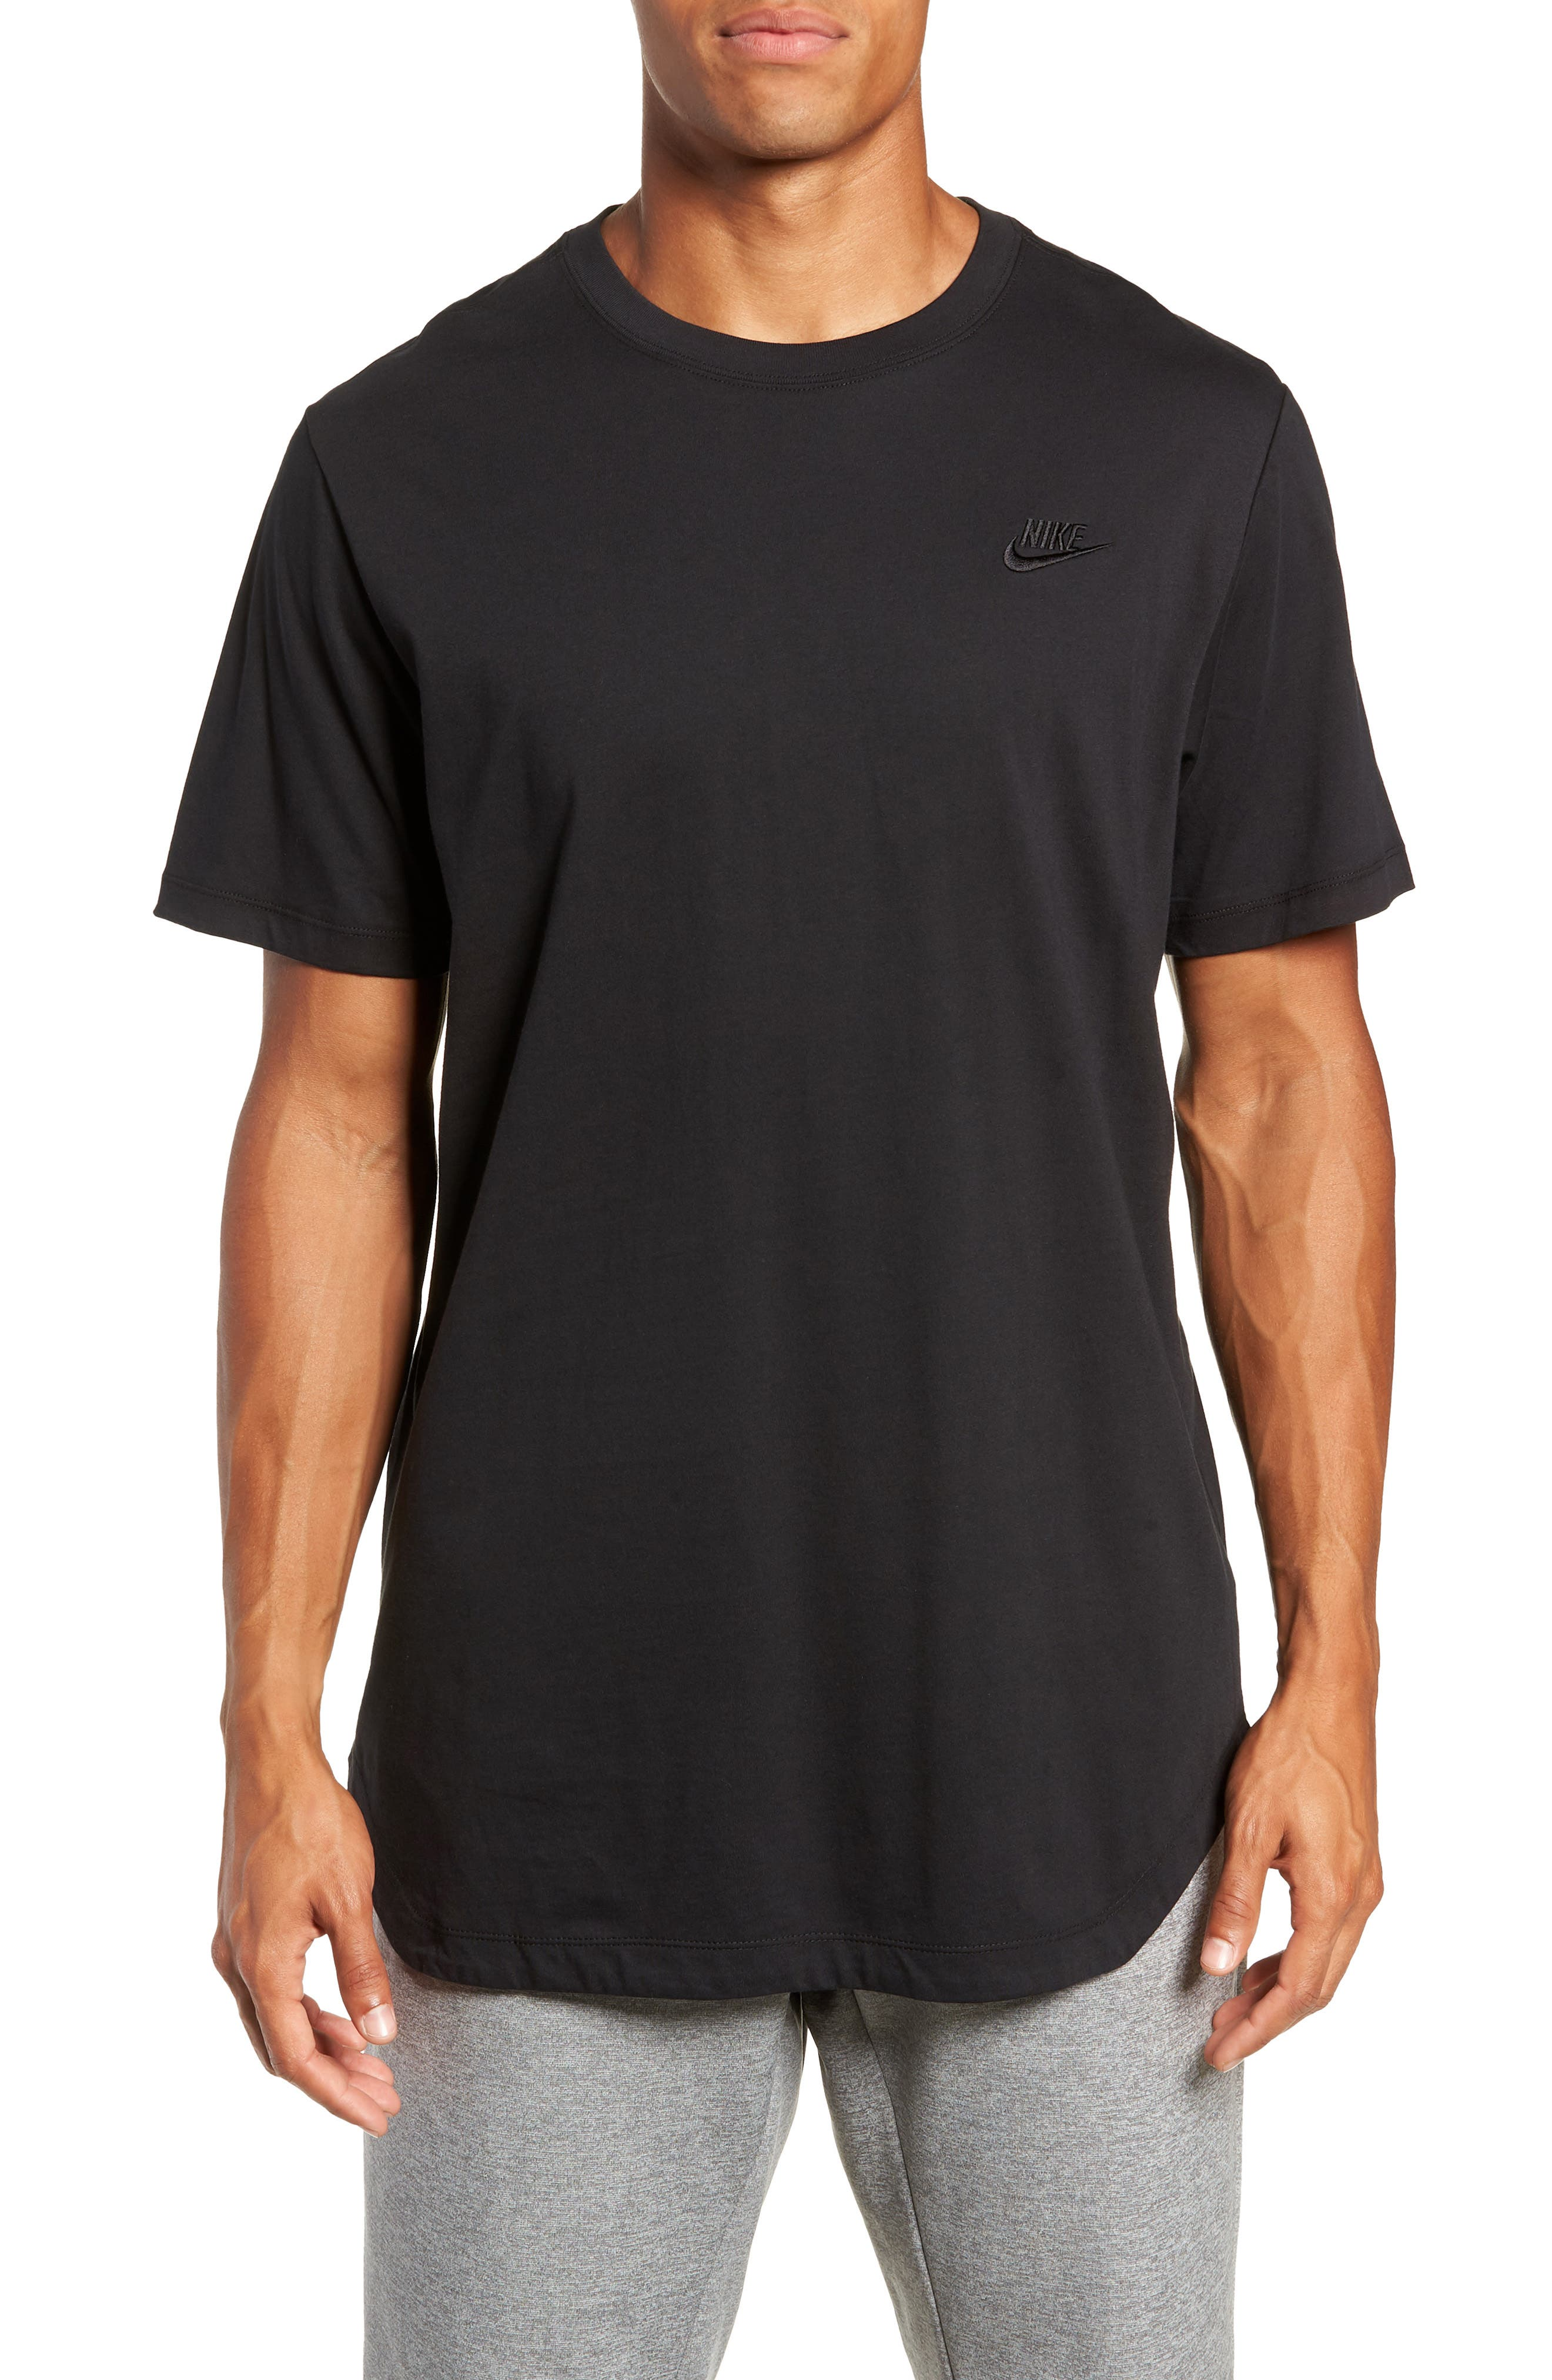 NSW Futura T-Shirt,                         Main,                         color, BLACK/ BLACK